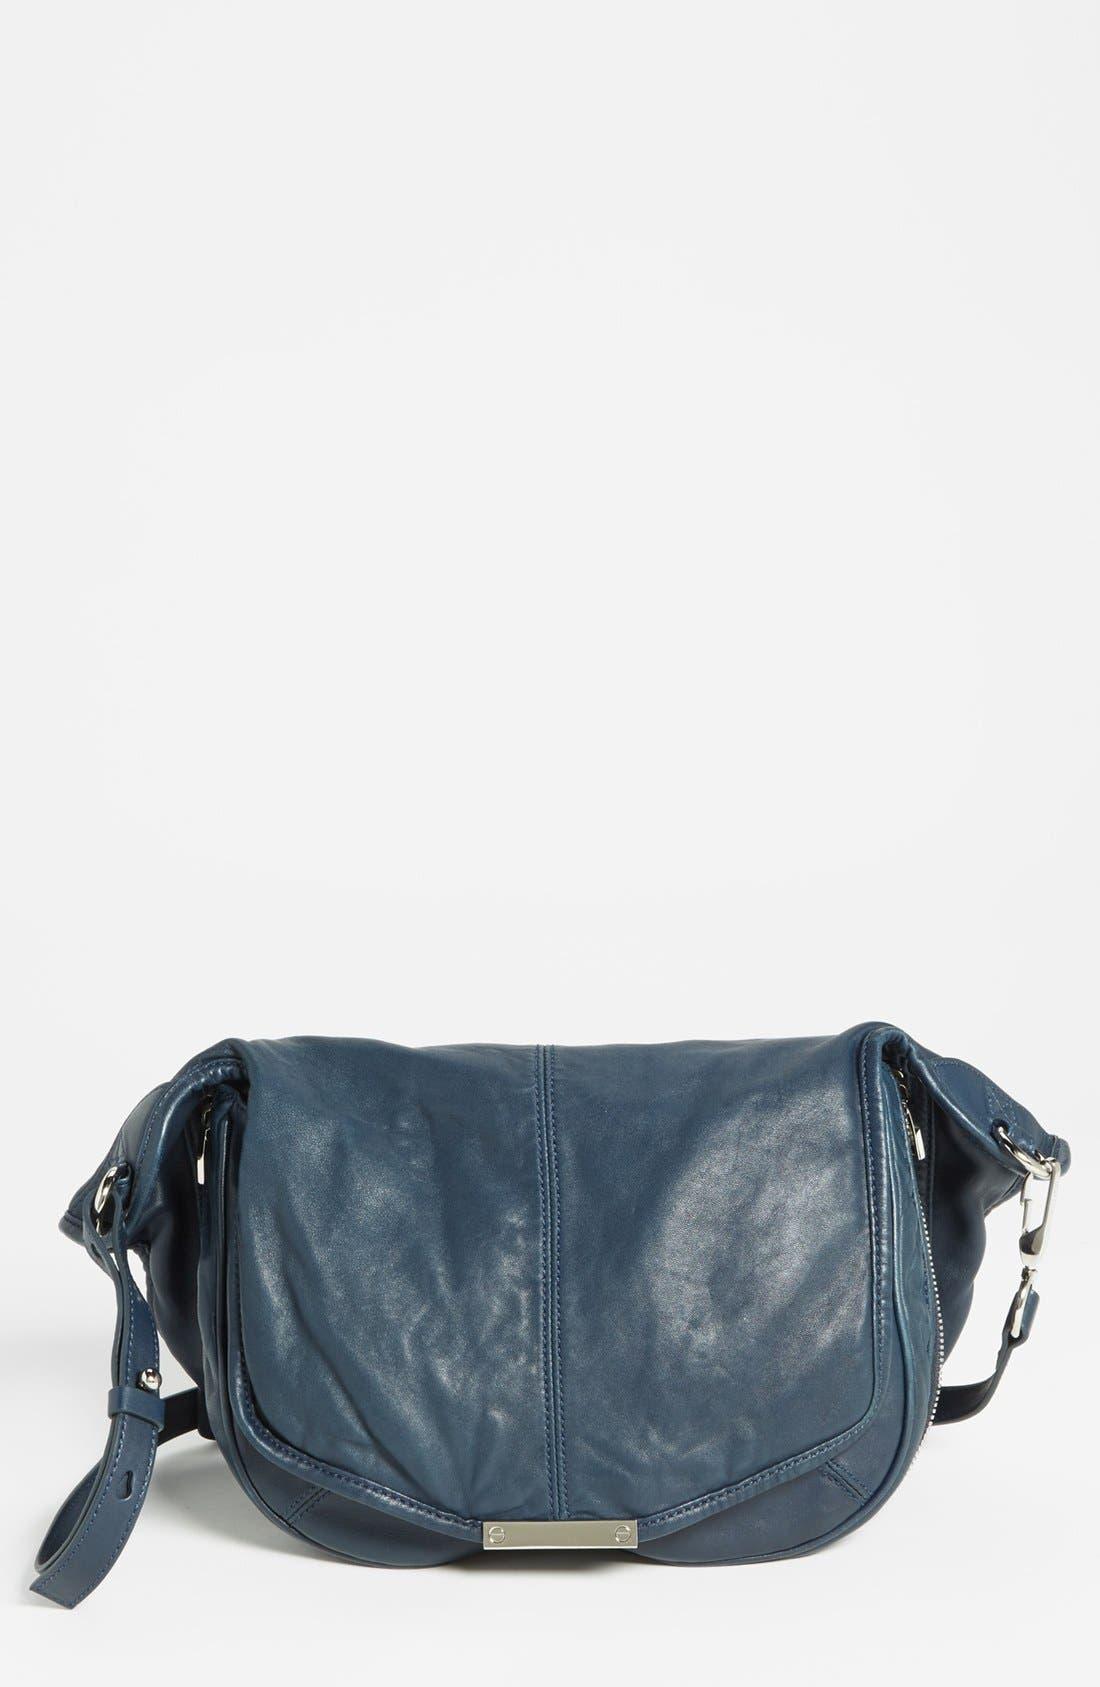 Main Image - Alexander Wang 'Iris - Nickel' Leather Crossbody Bag, Medium